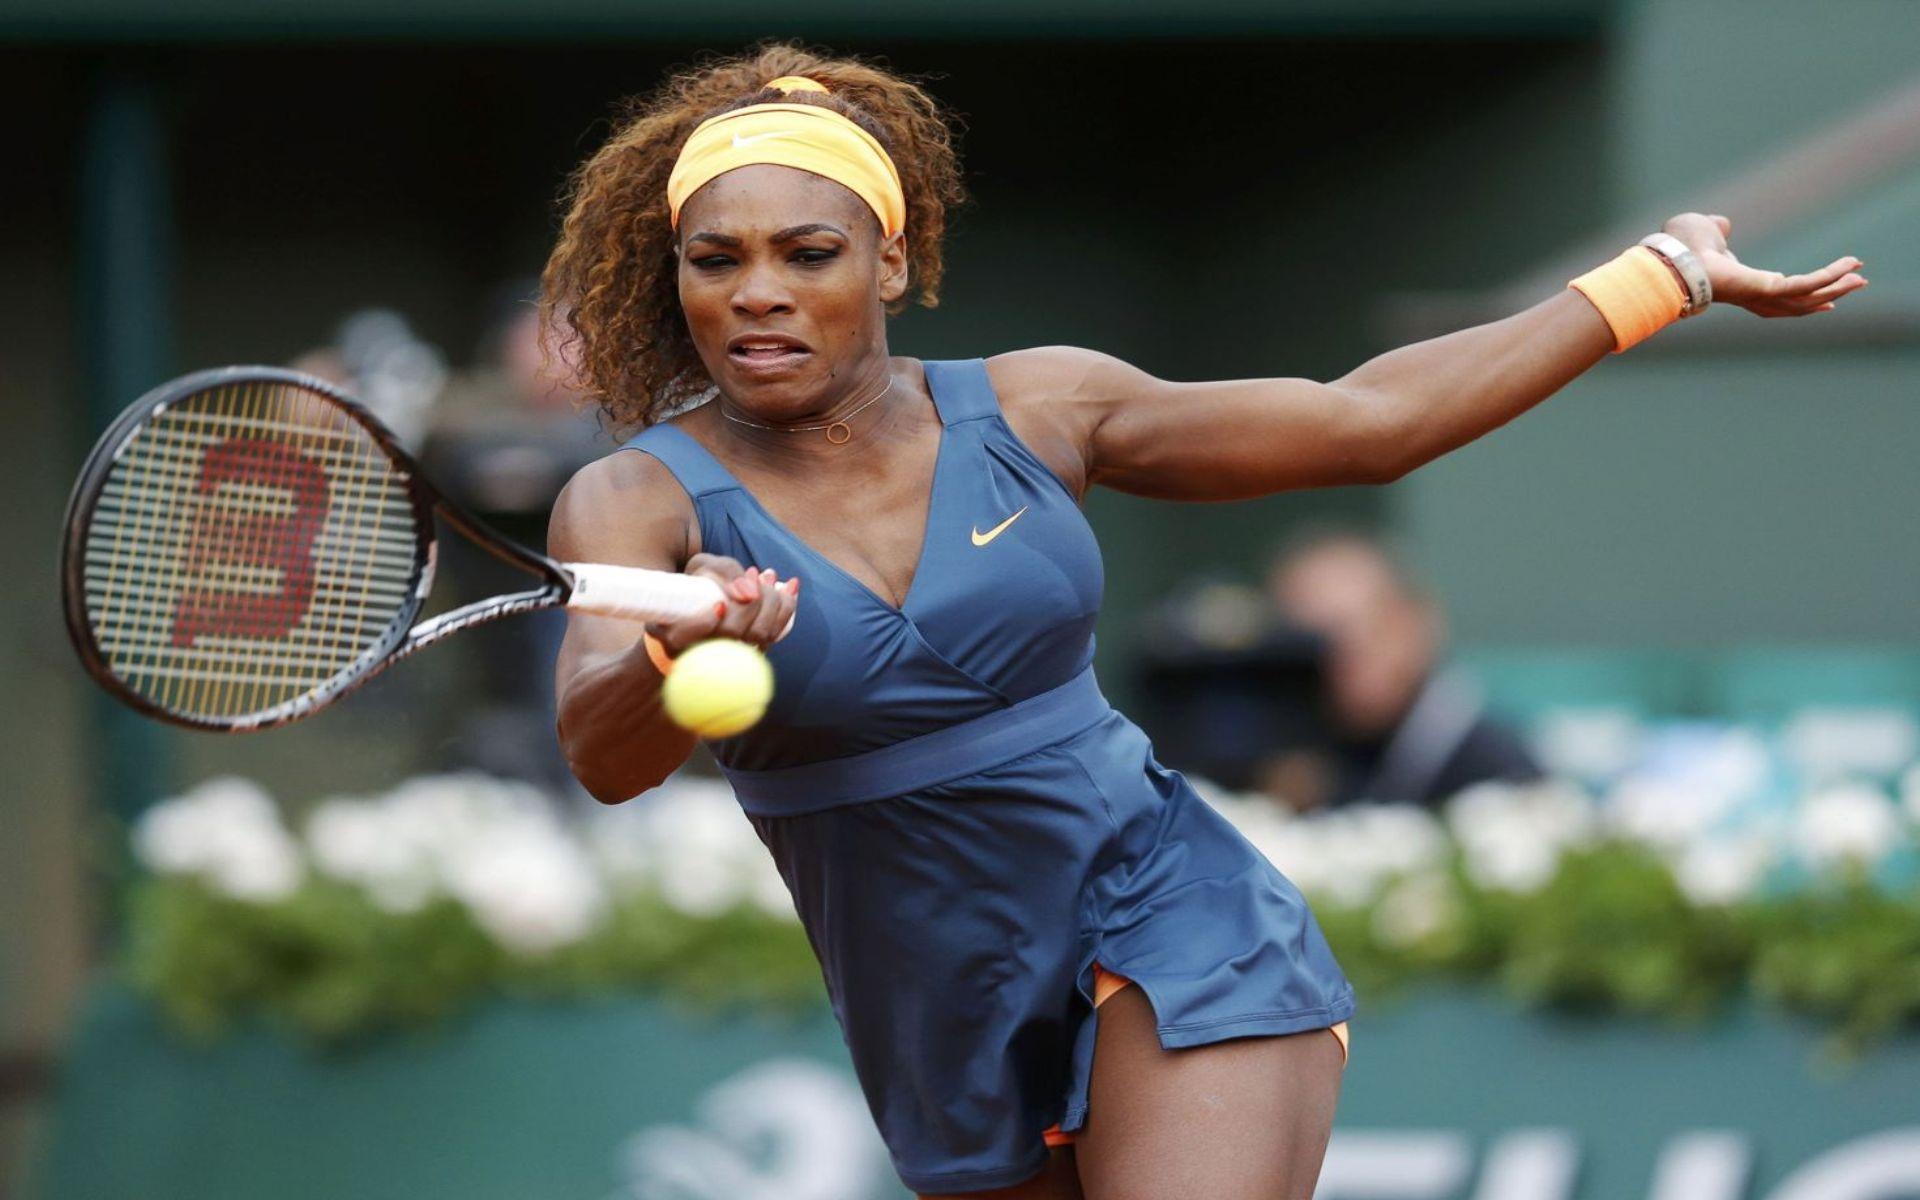 Serena Williams Wallpapers 4